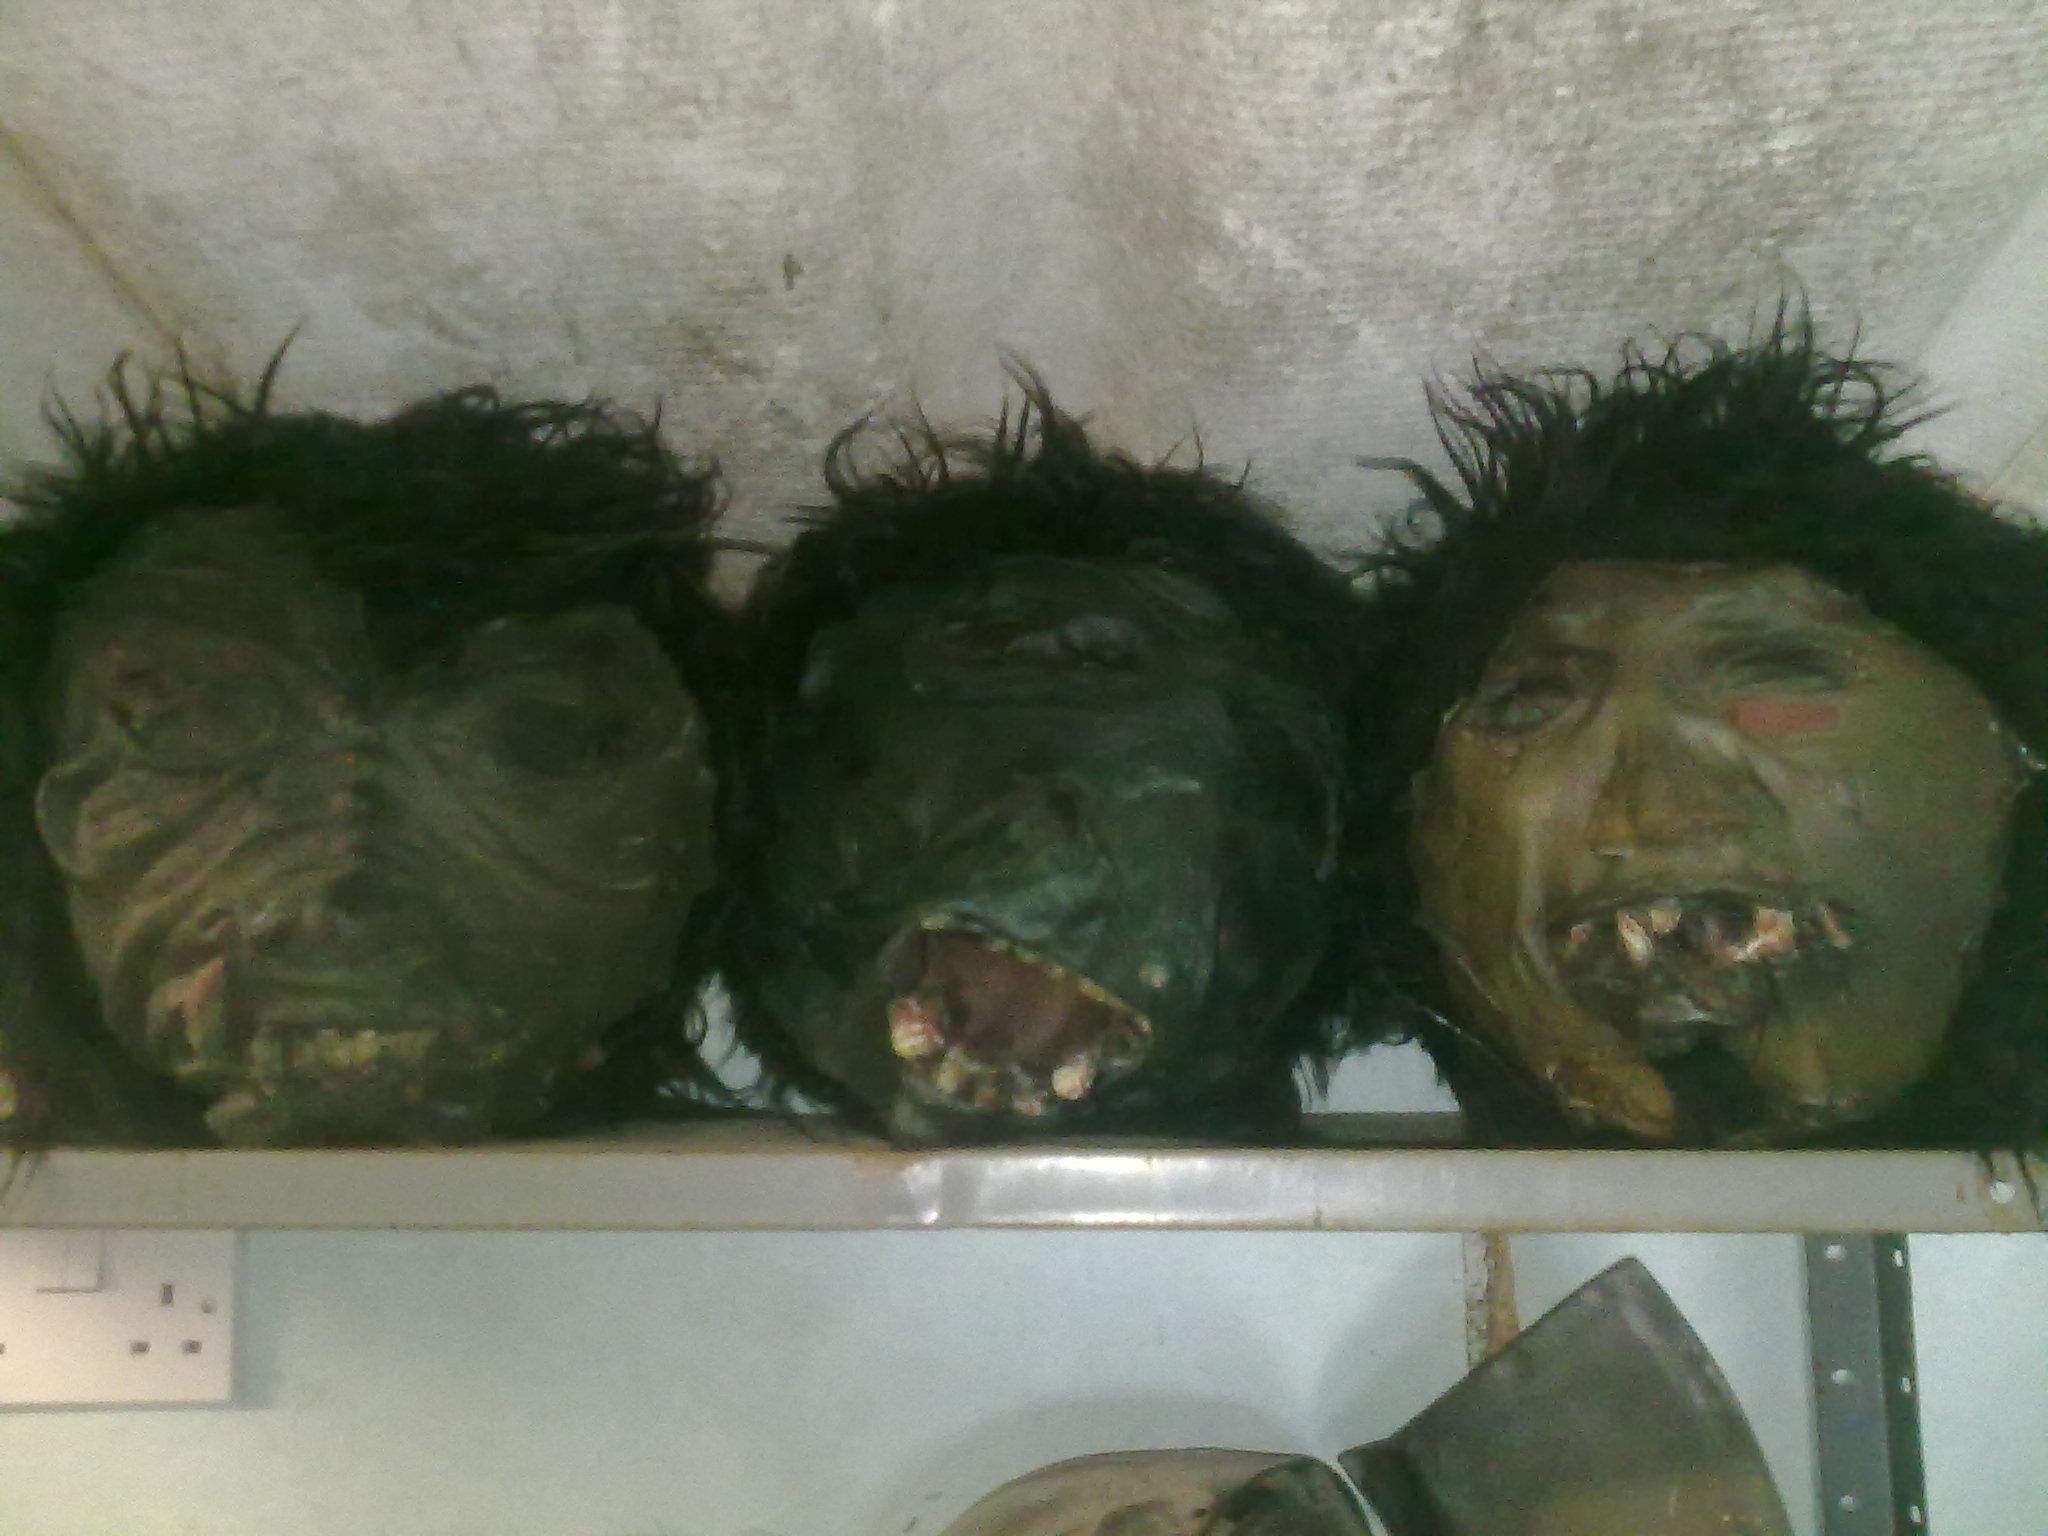 Goblinoid heads/foam balls